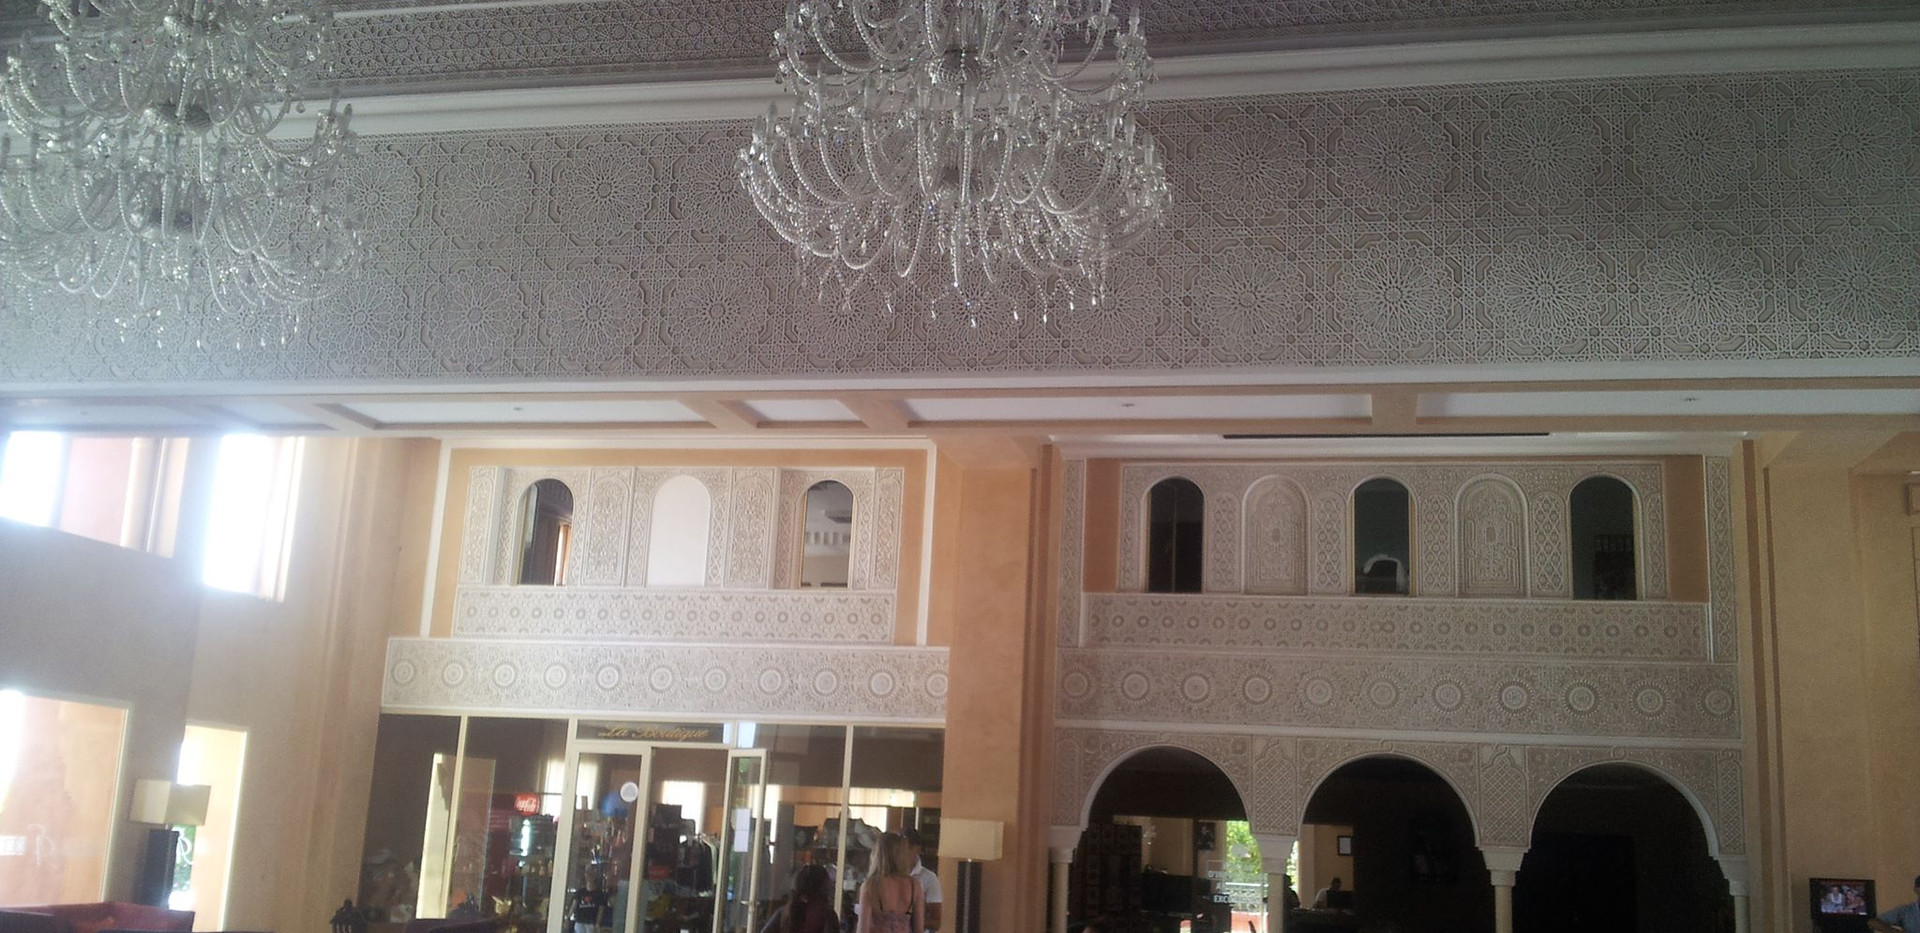 Morocco 2013-7.jpg